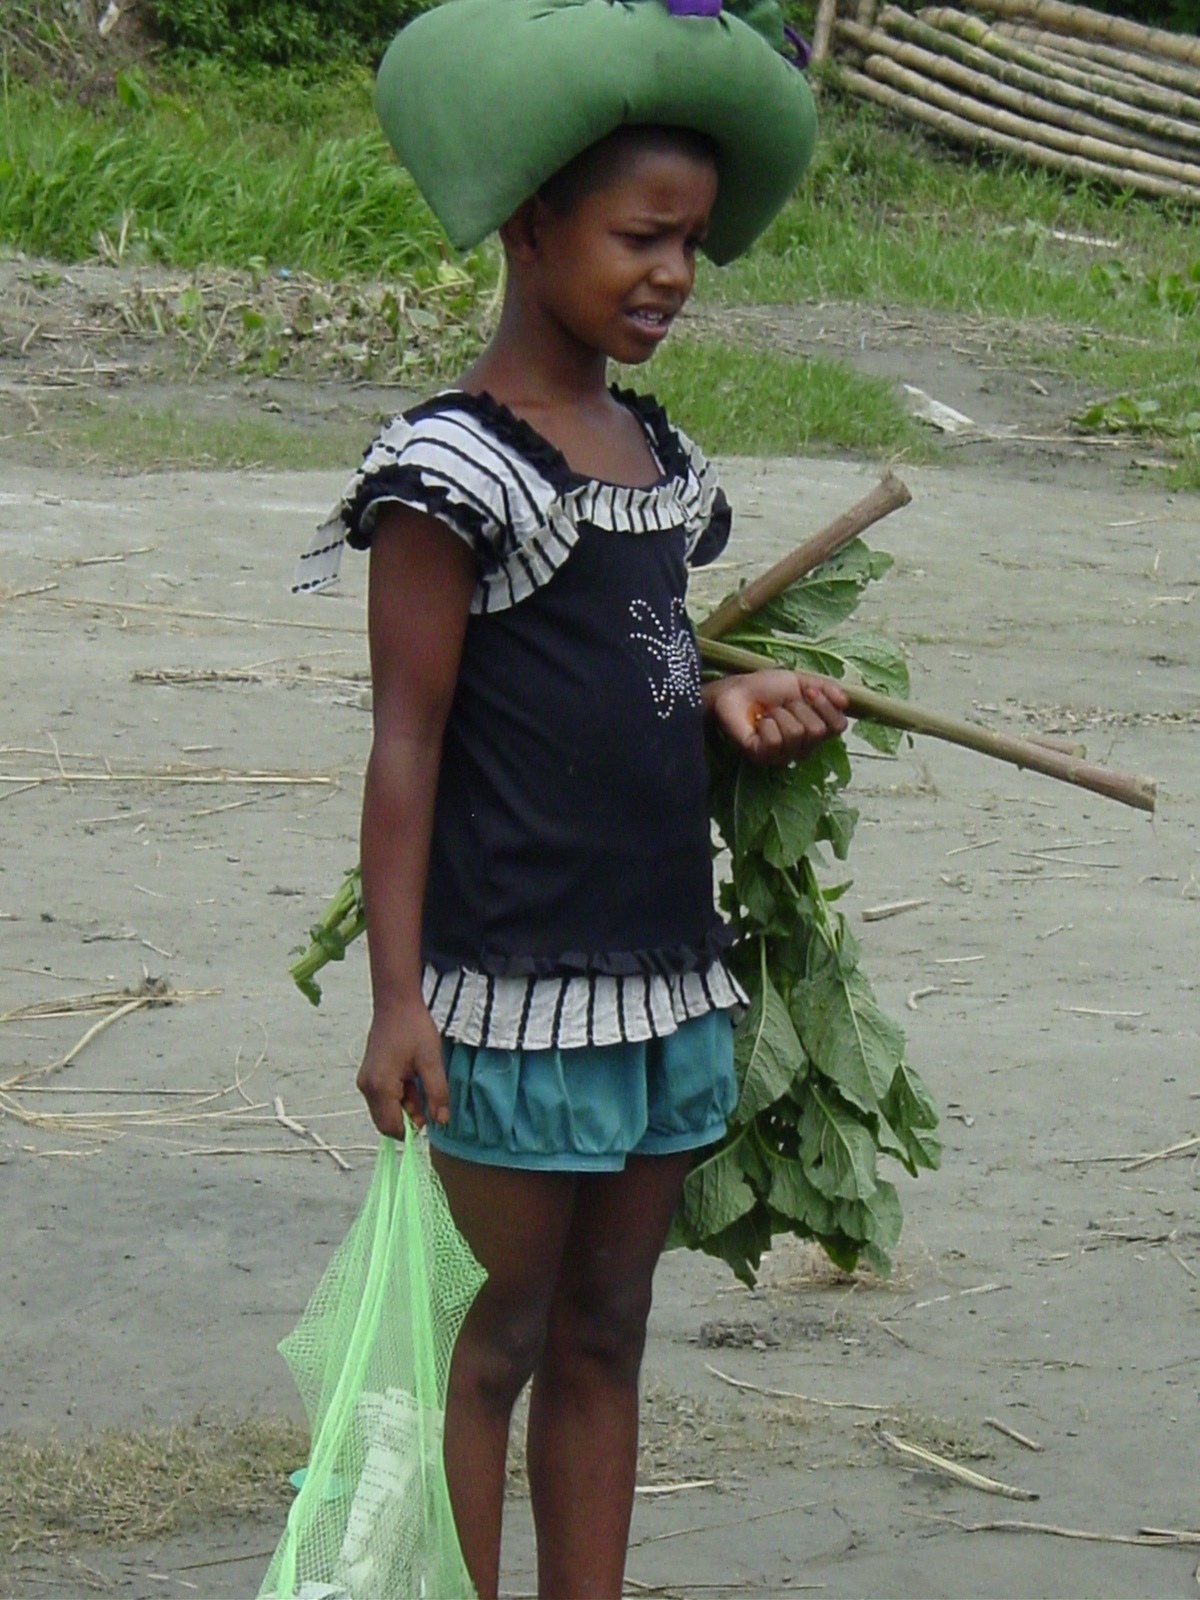 A girl in modern dress